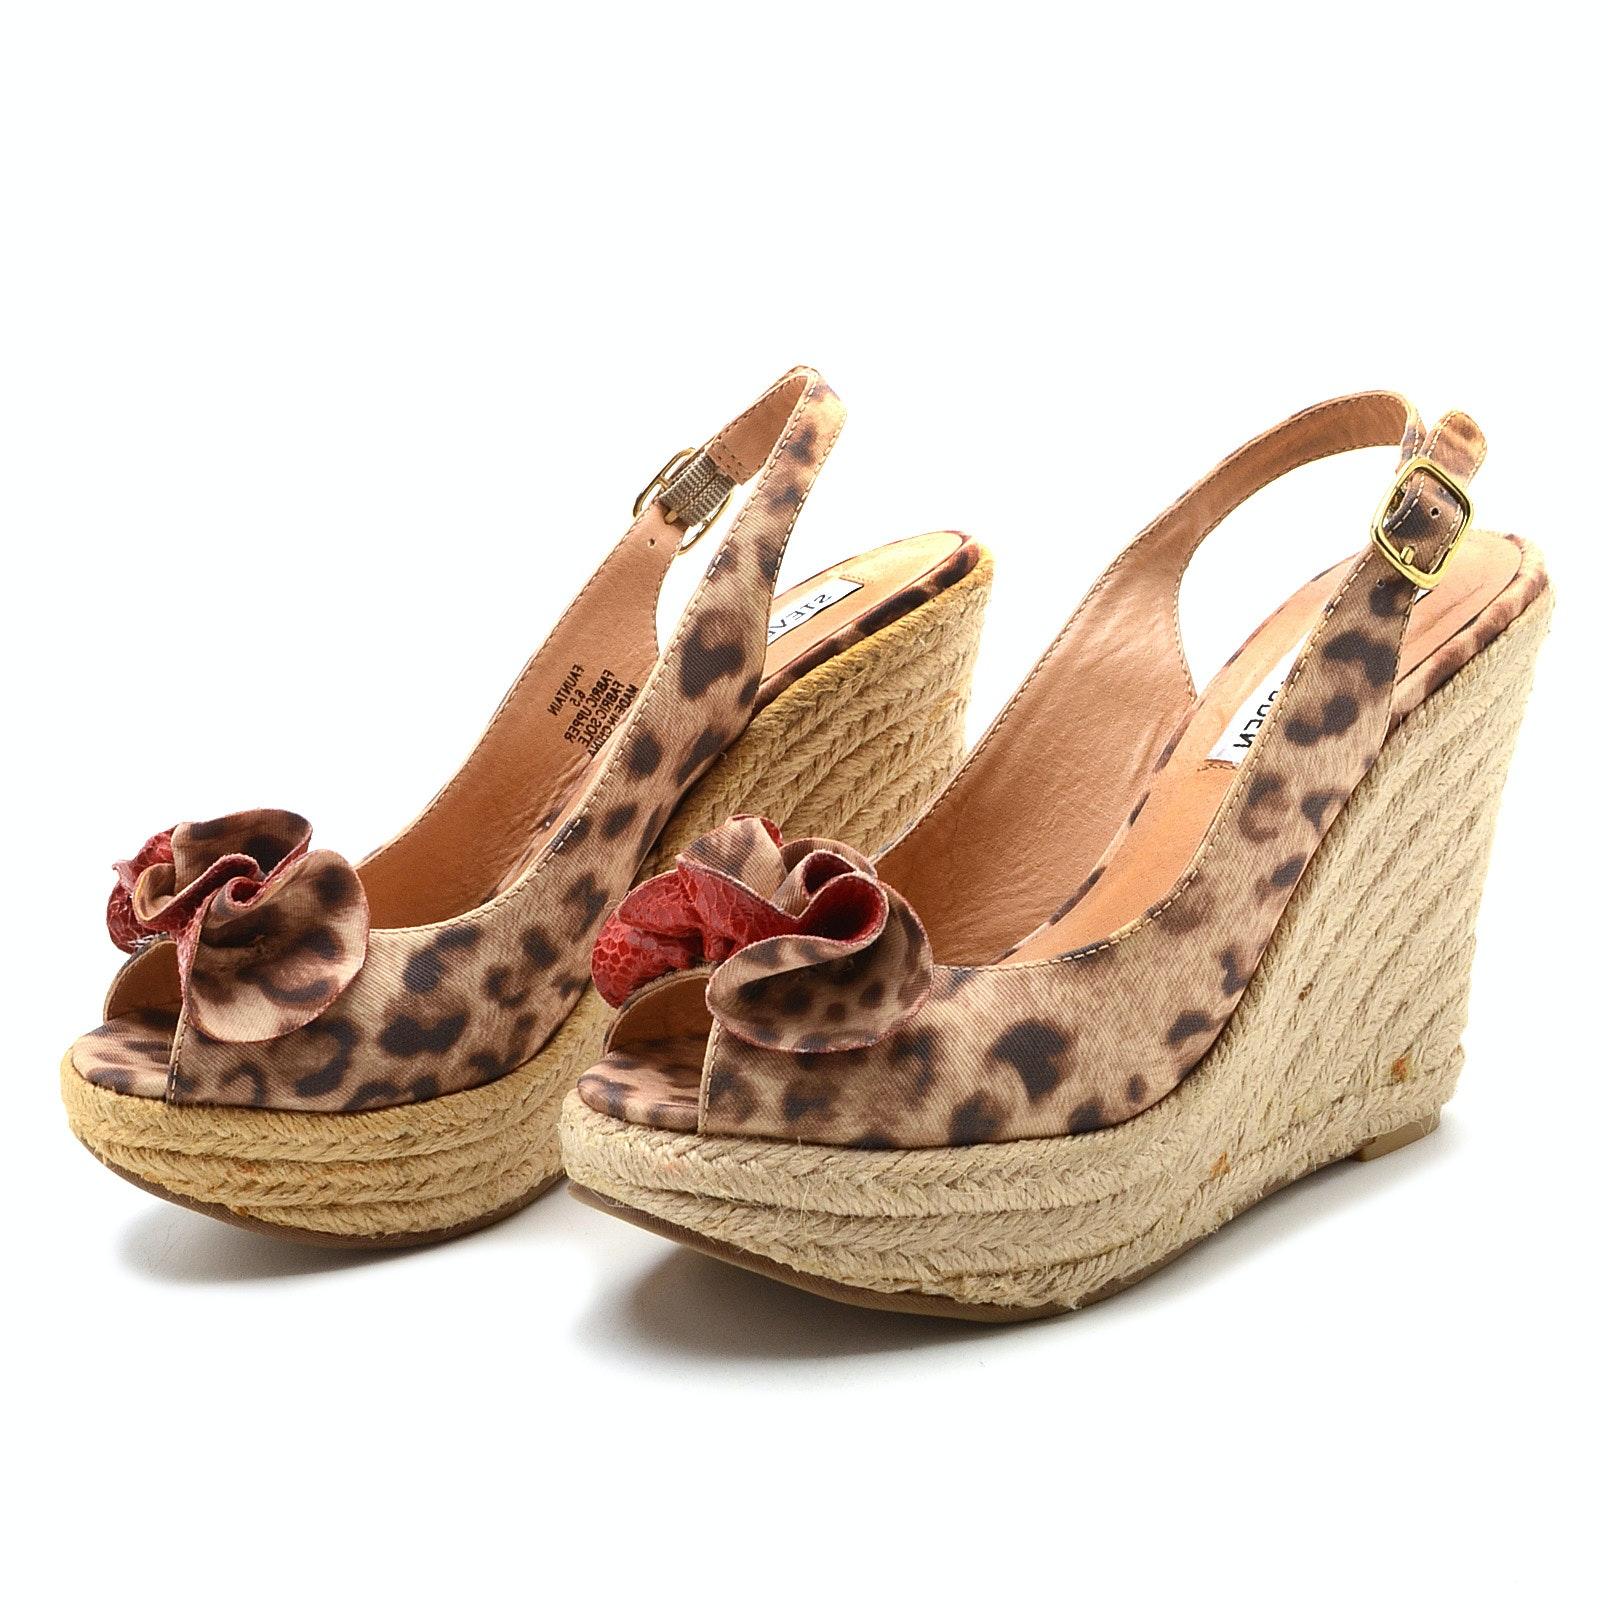 Steve Madden Espadrille Wedge Platform Leopard Print Fauntain Sandals